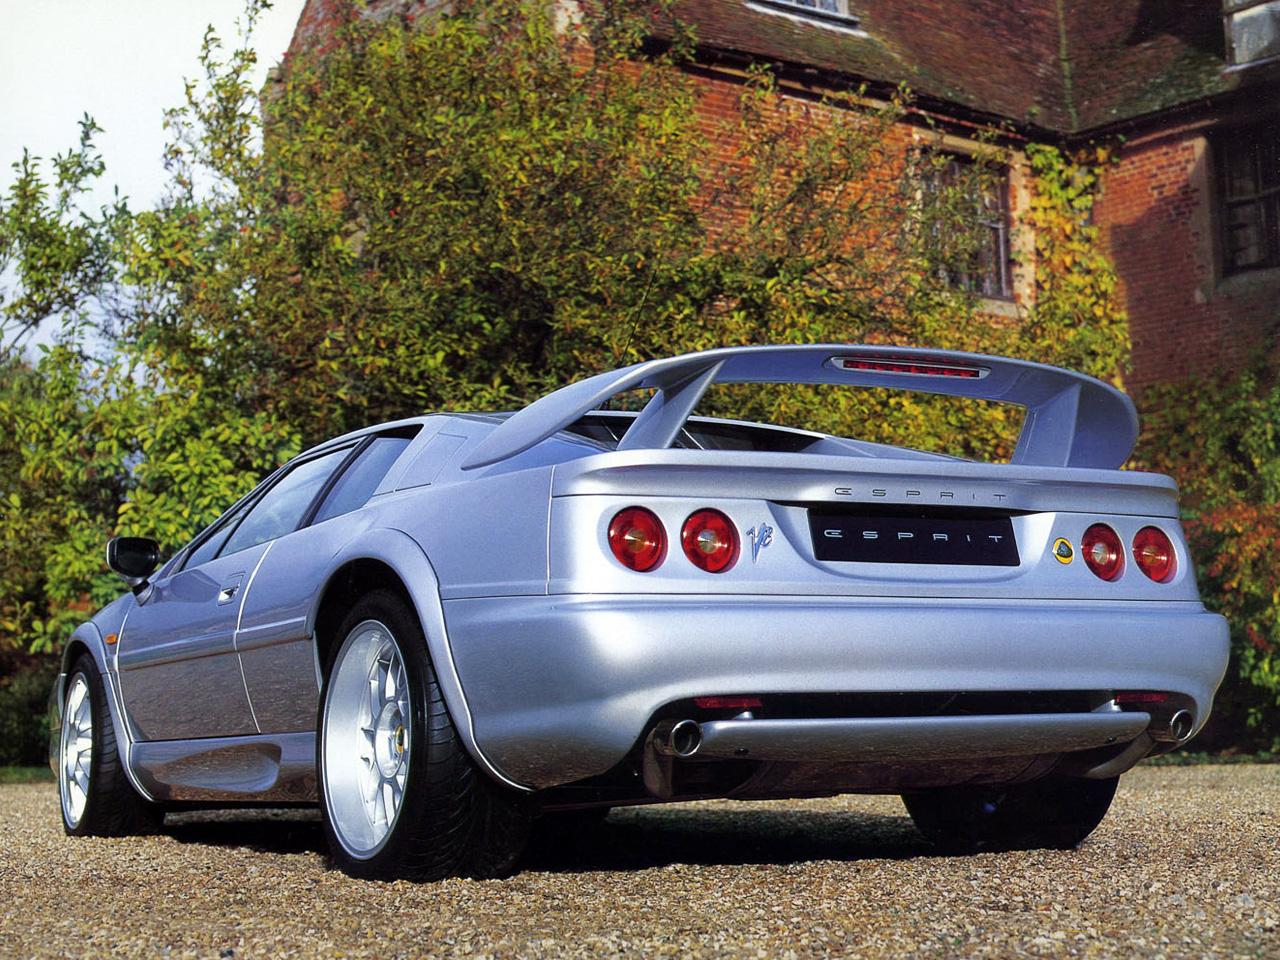 2004 Lotus Esprit 6 Widescreen Car Wallpaper